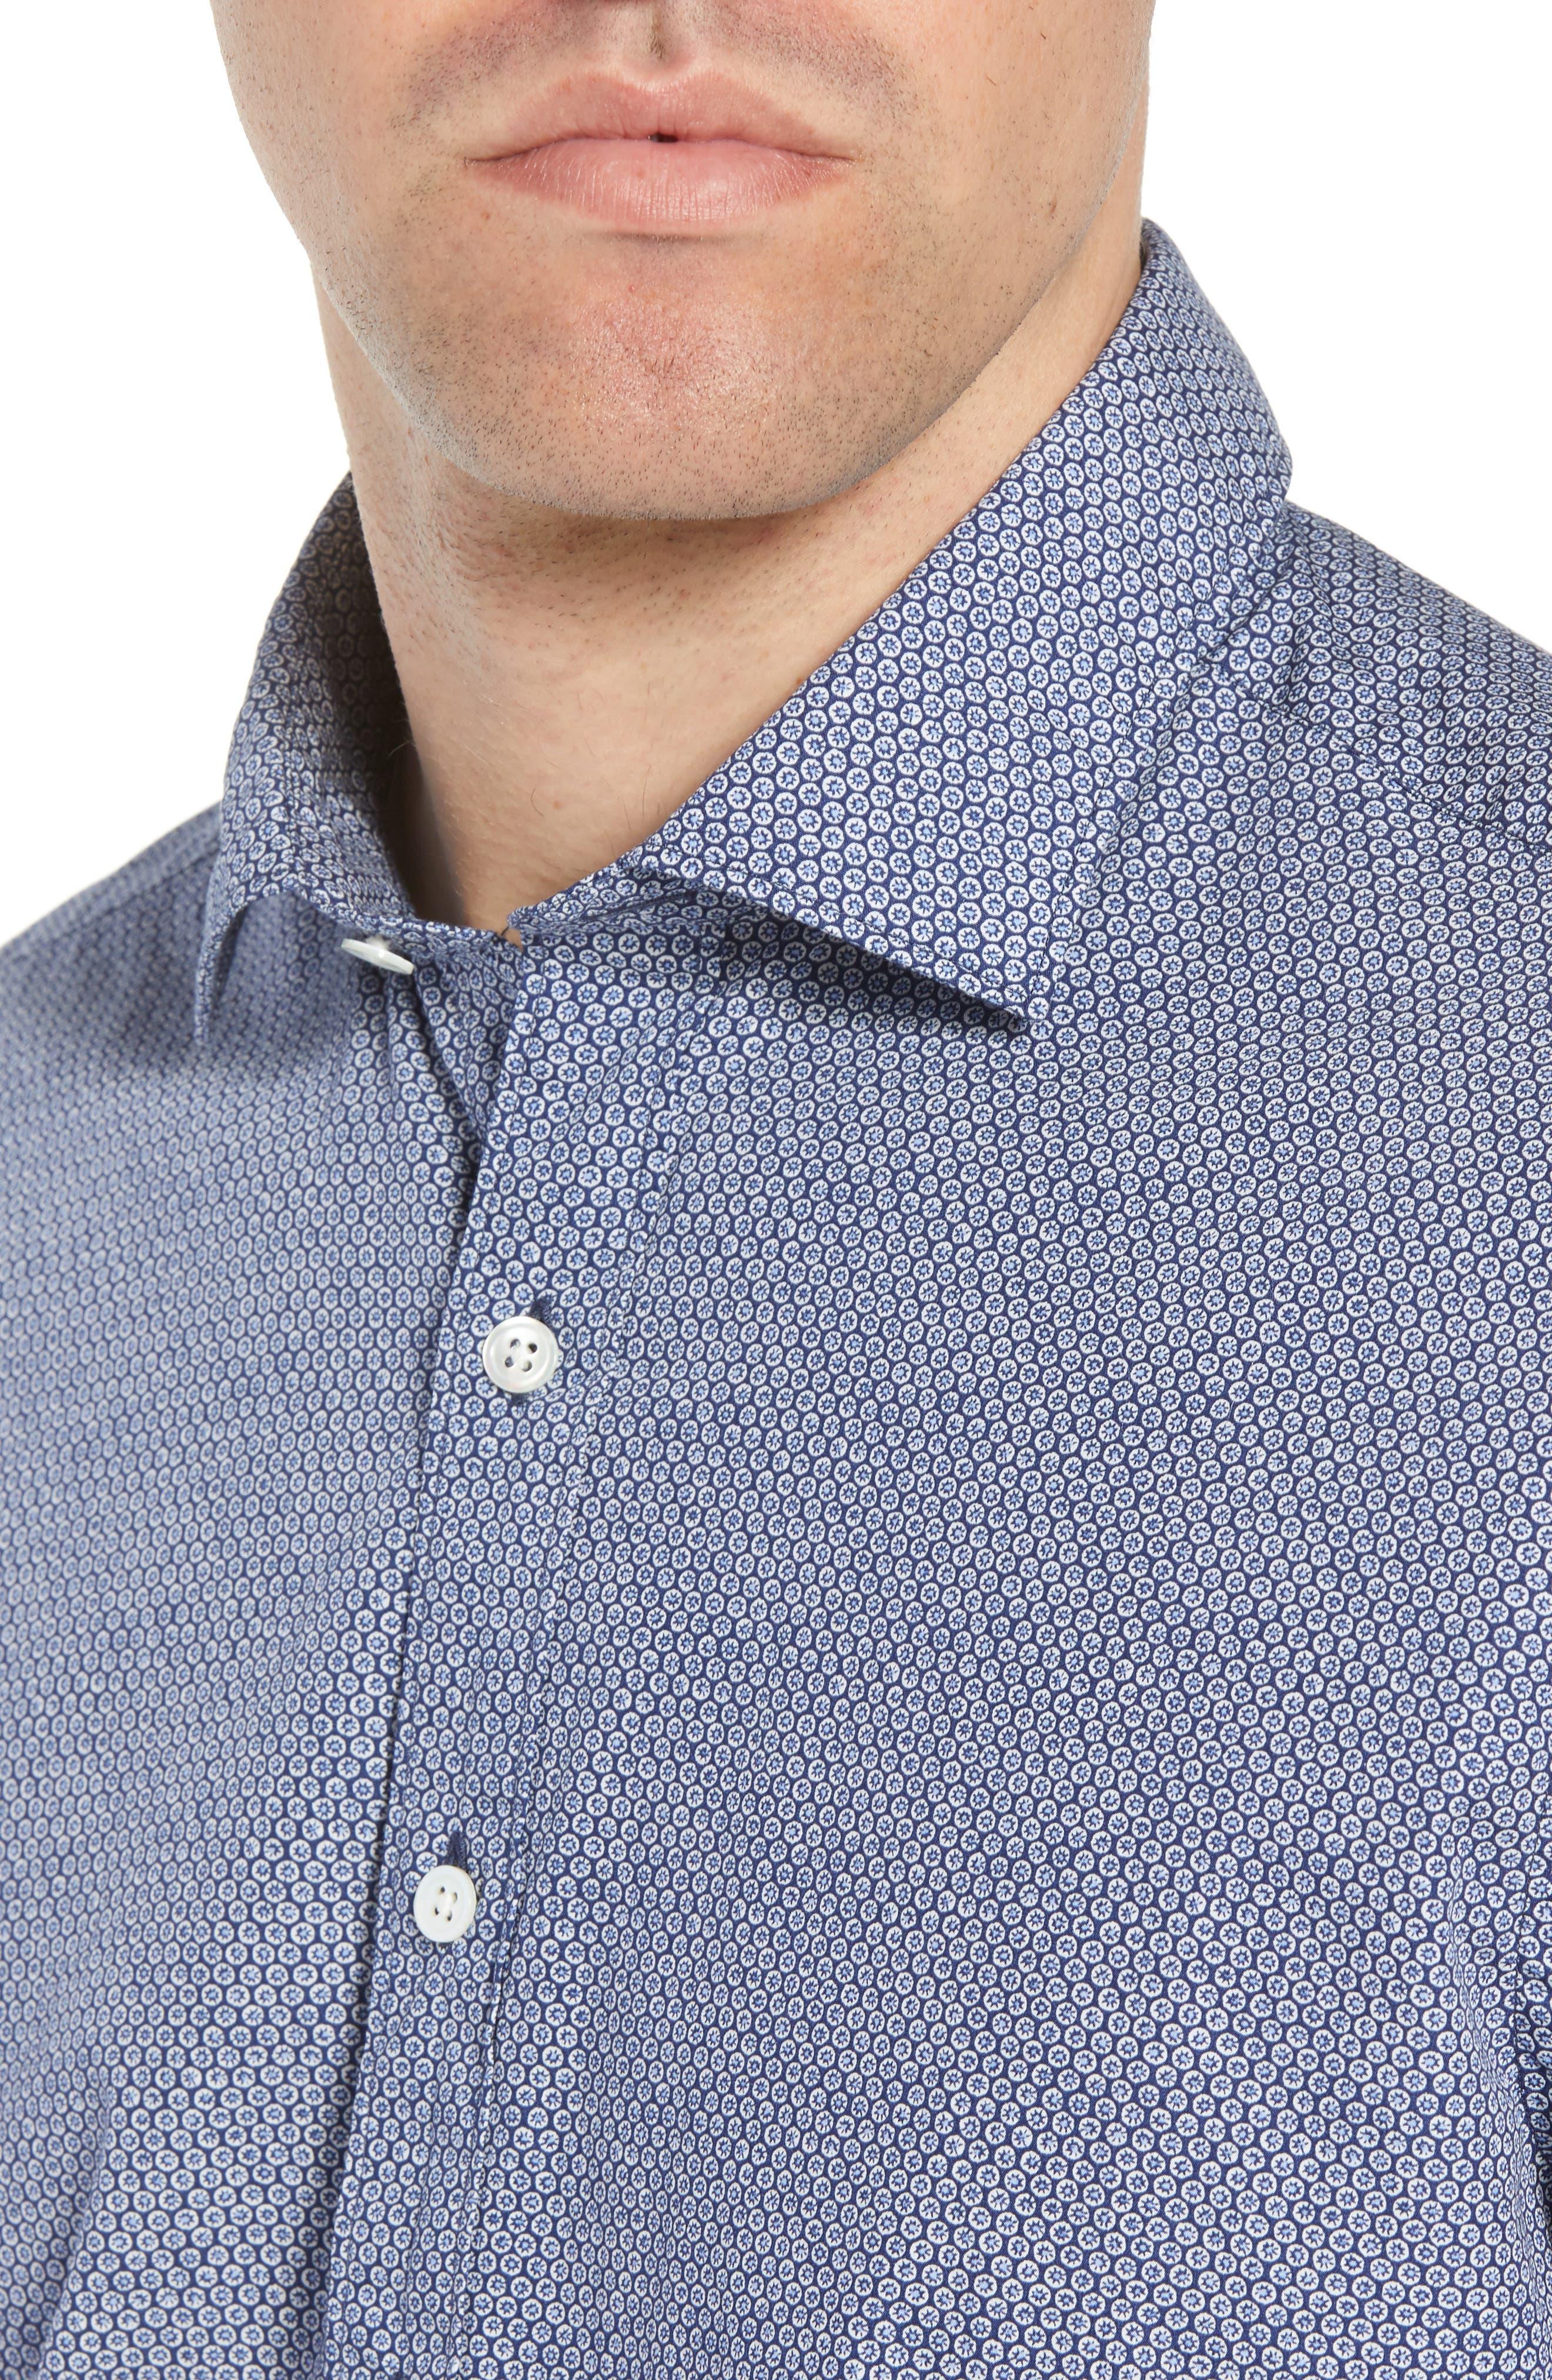 Beacon Point Regular Fit Sport Shirt,                             Alternate thumbnail 4, color,                             410